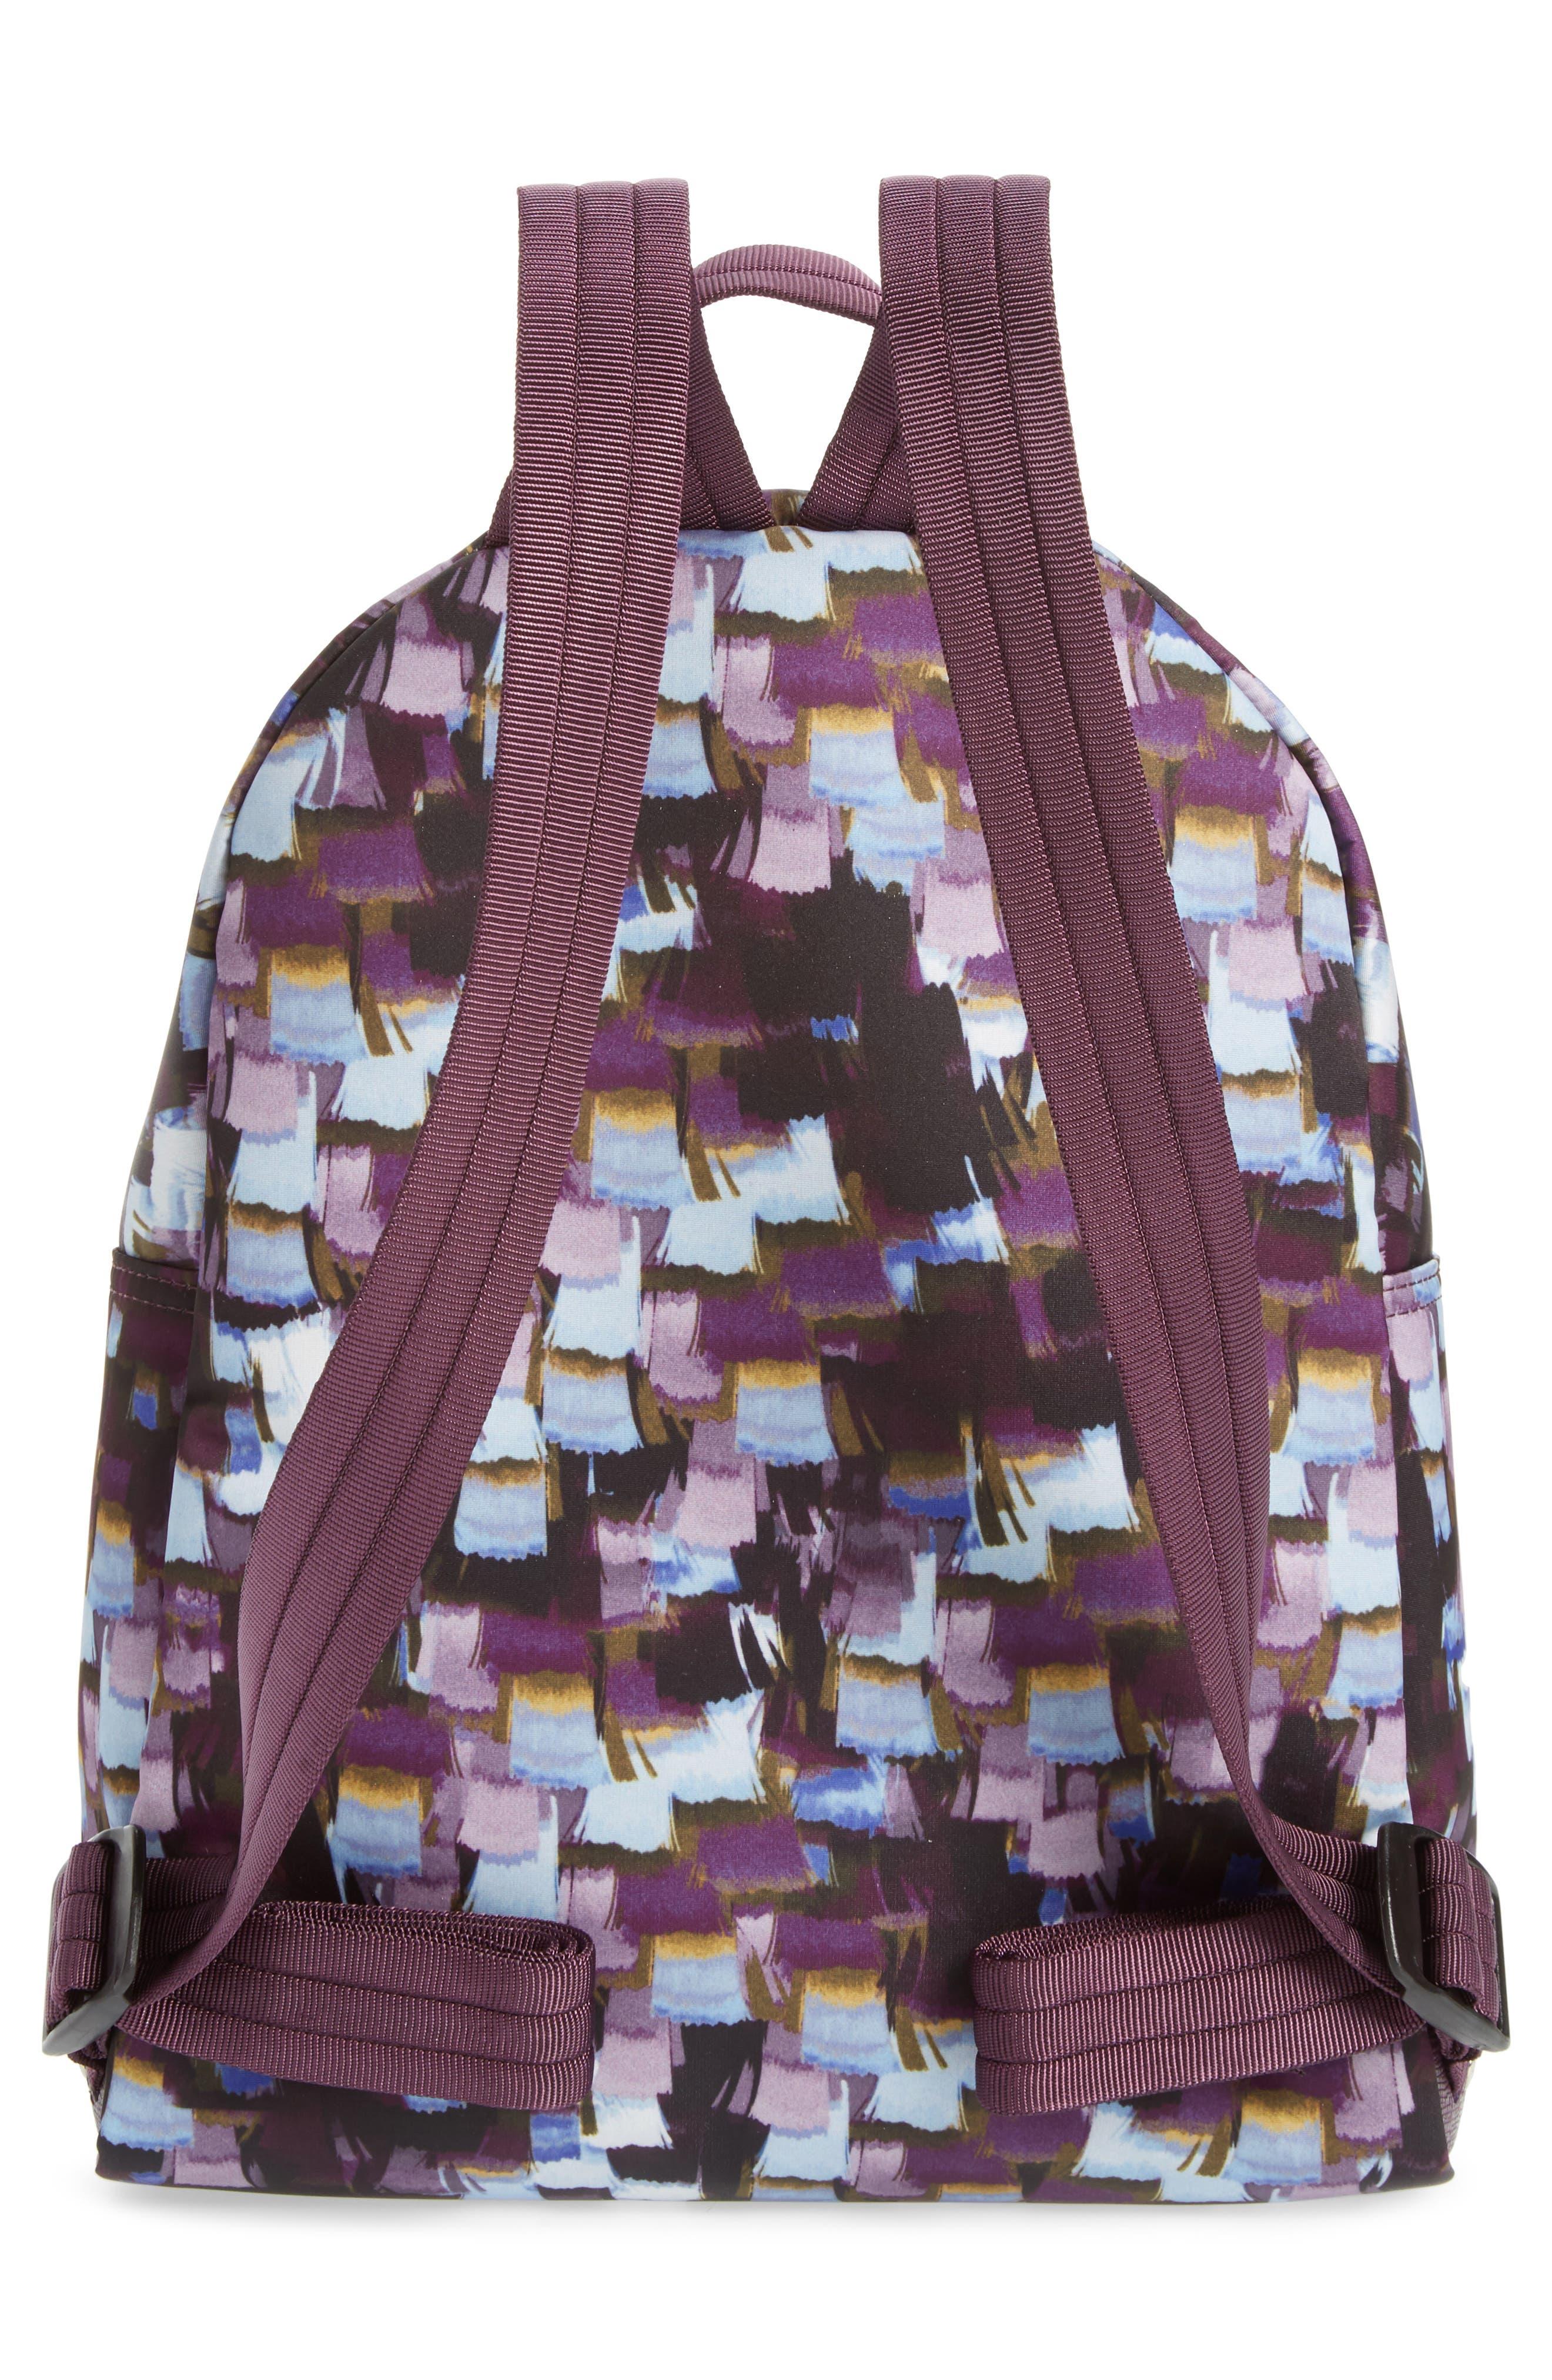 Le Pliage Neo - Vibrations Nylon Backpack,                             Alternate thumbnail 3, color,                             500